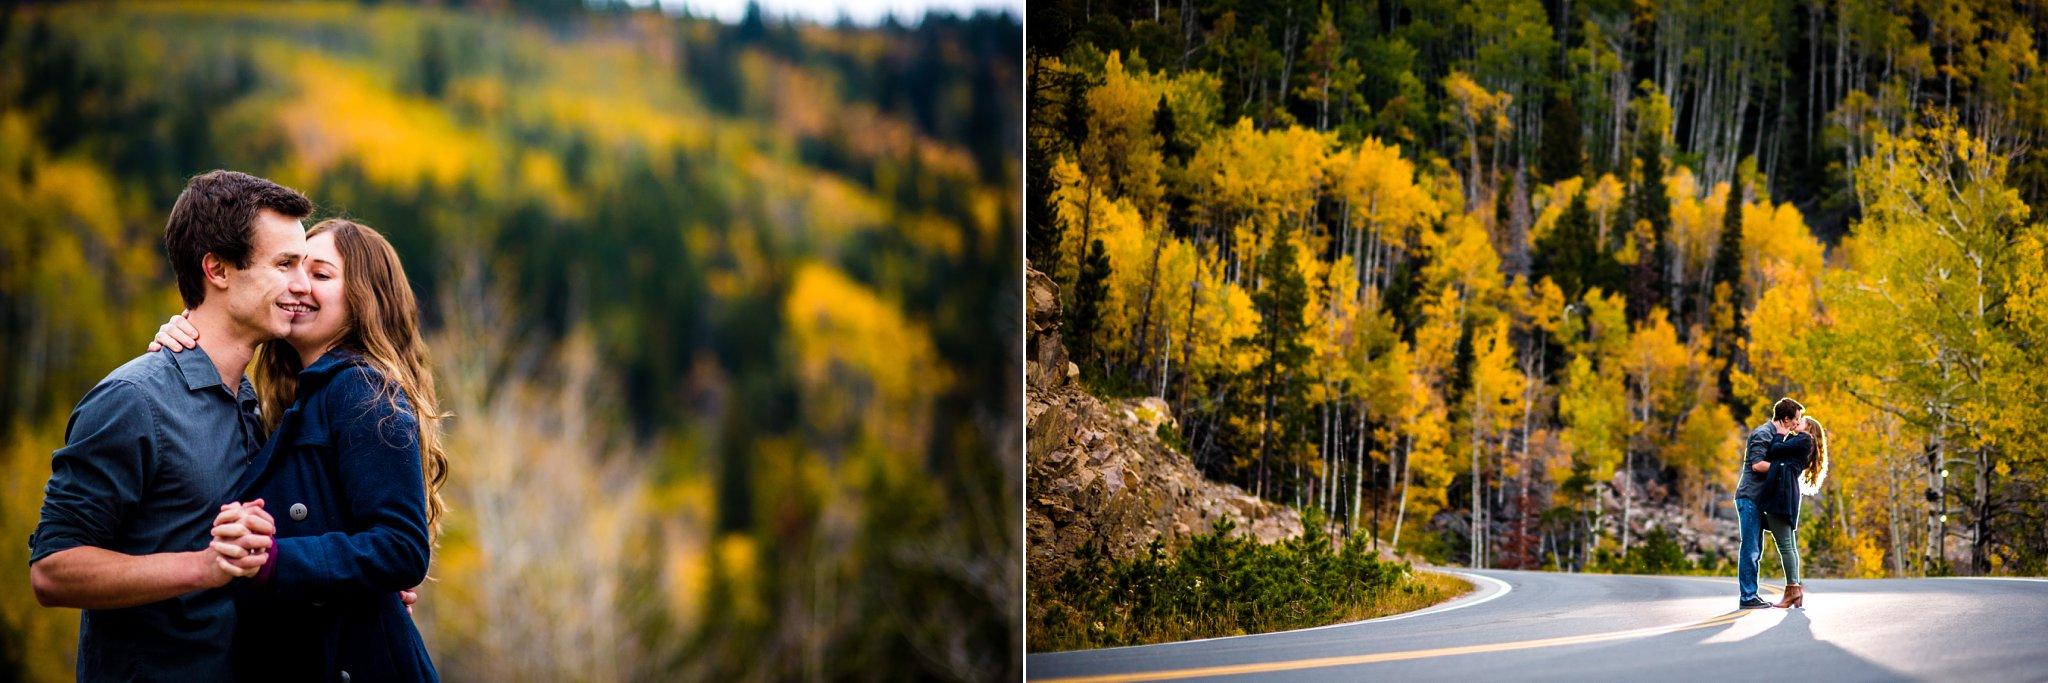 Rocky Mountain National Park Engagement Photos_0017.jpg